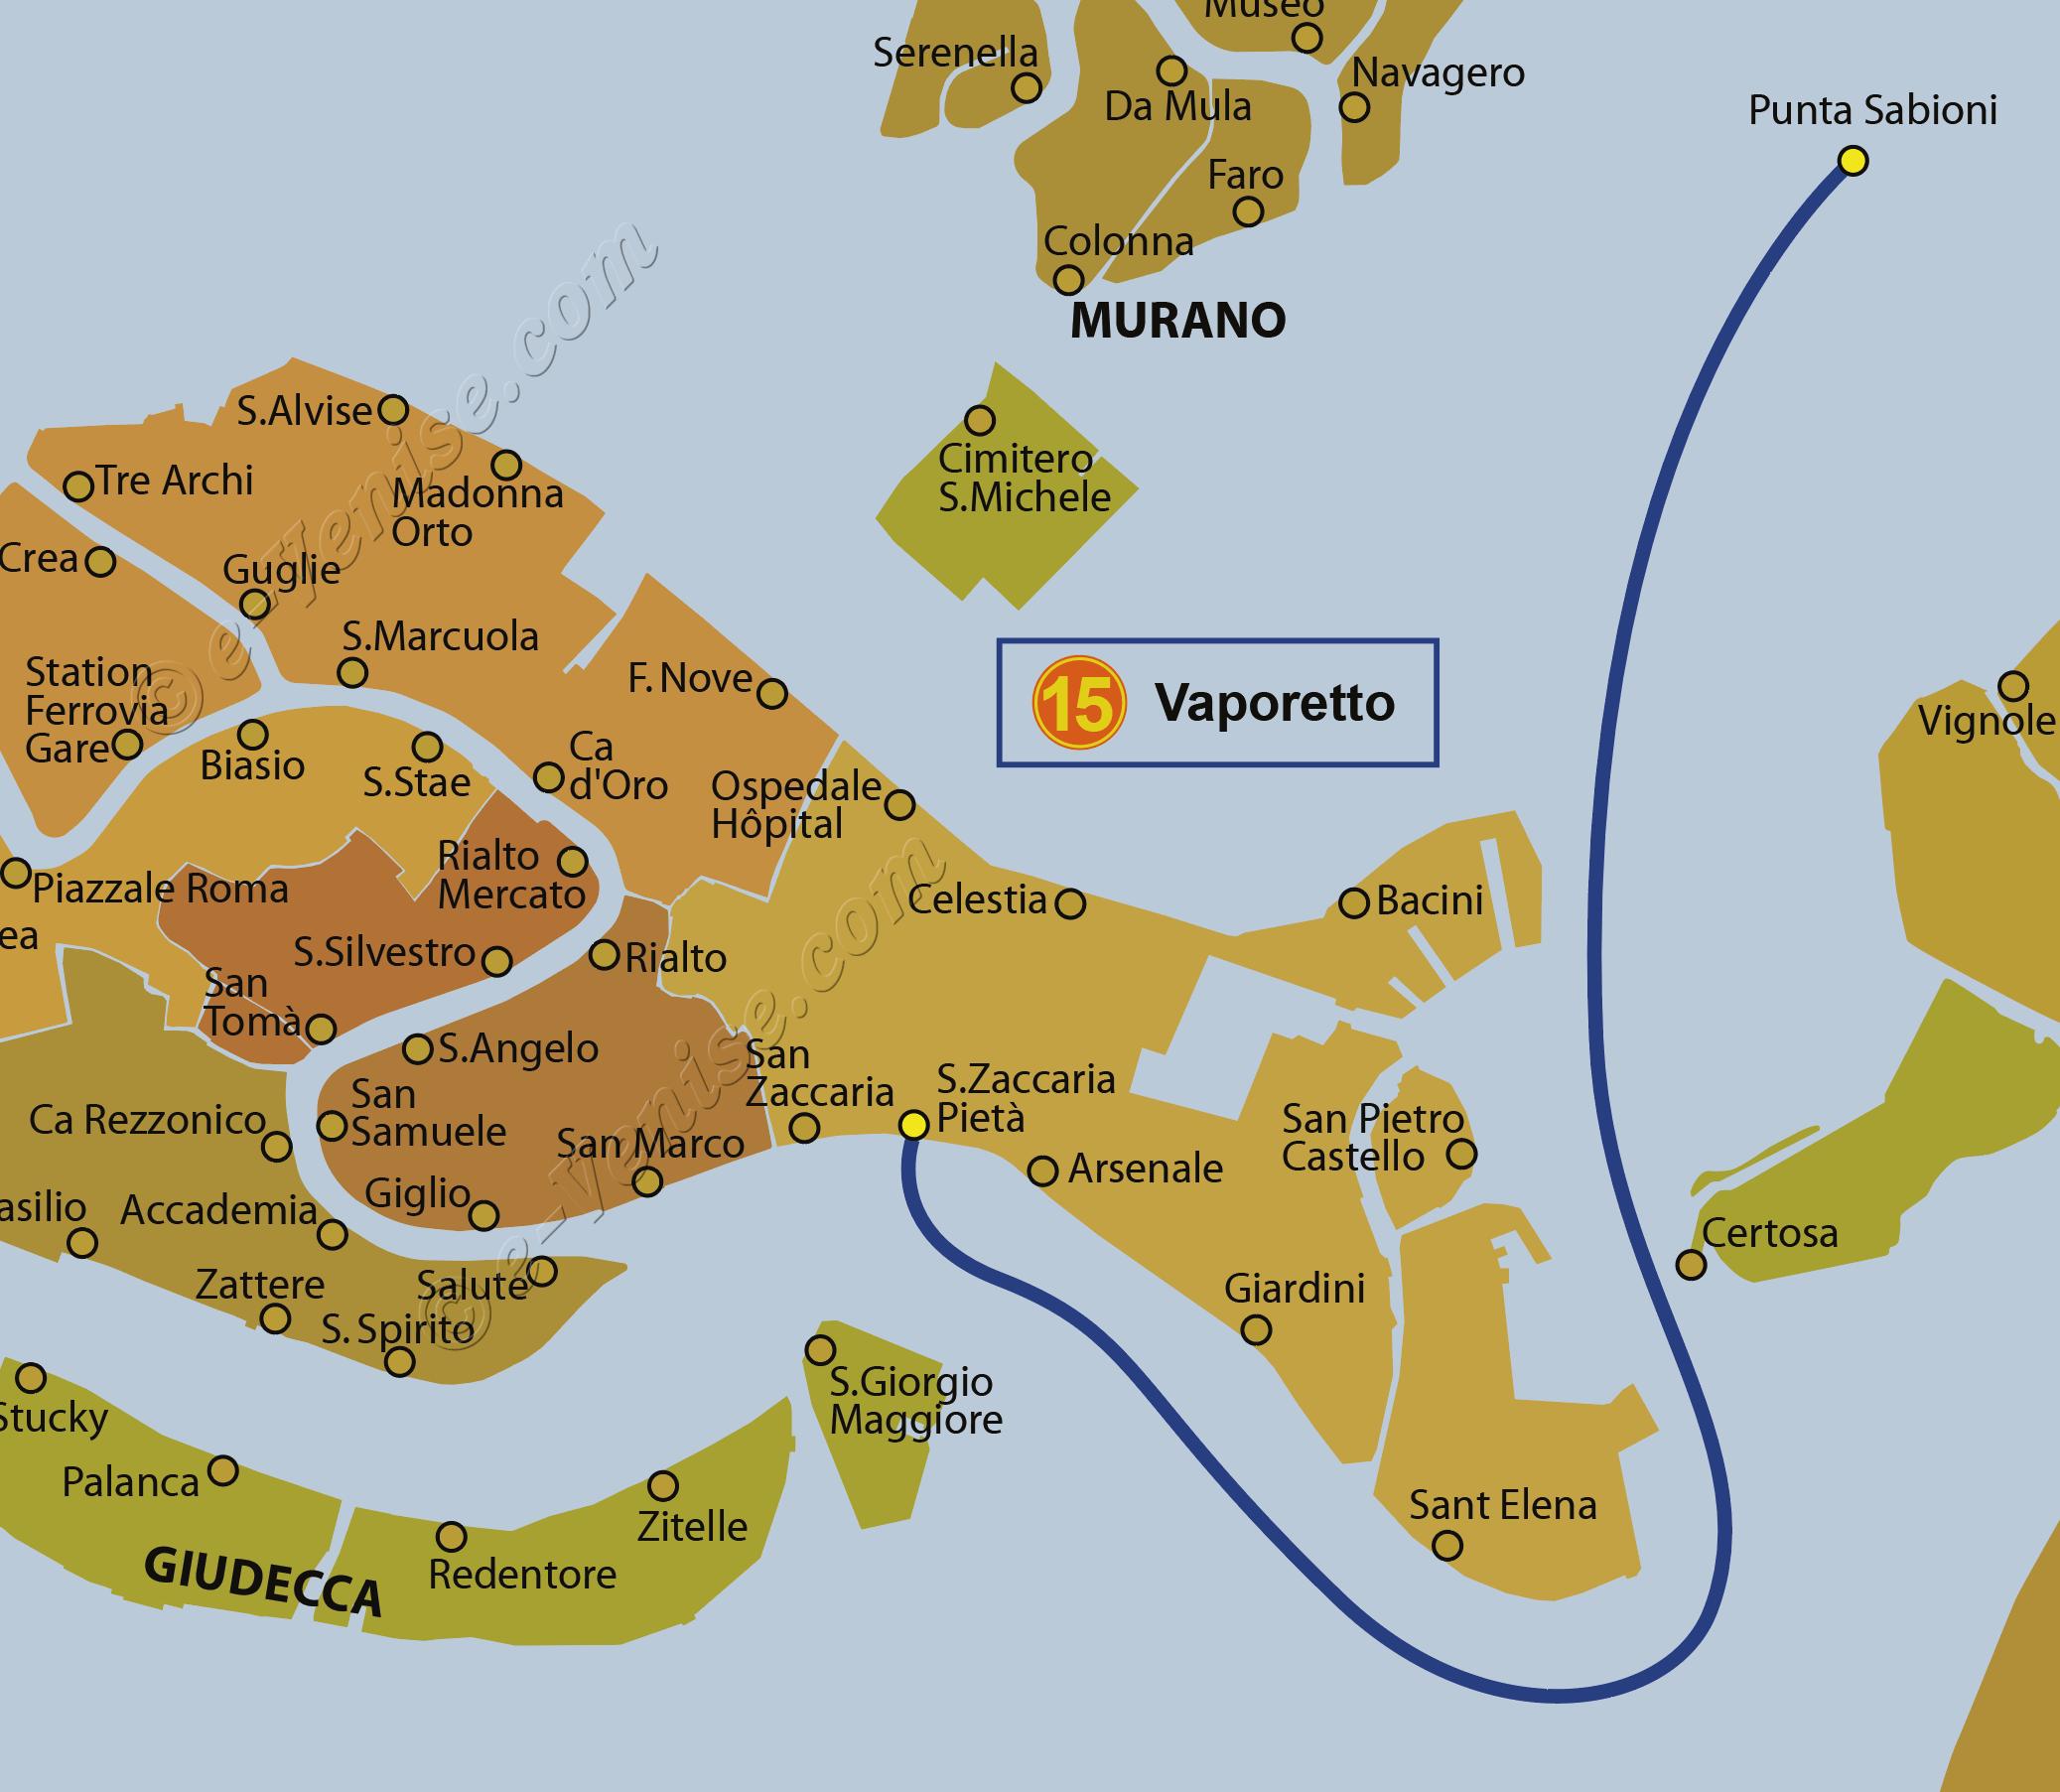 Carte Venise Et Alentours.Lignes Vaporetto Venise Actv Alilaguna E Venise Com